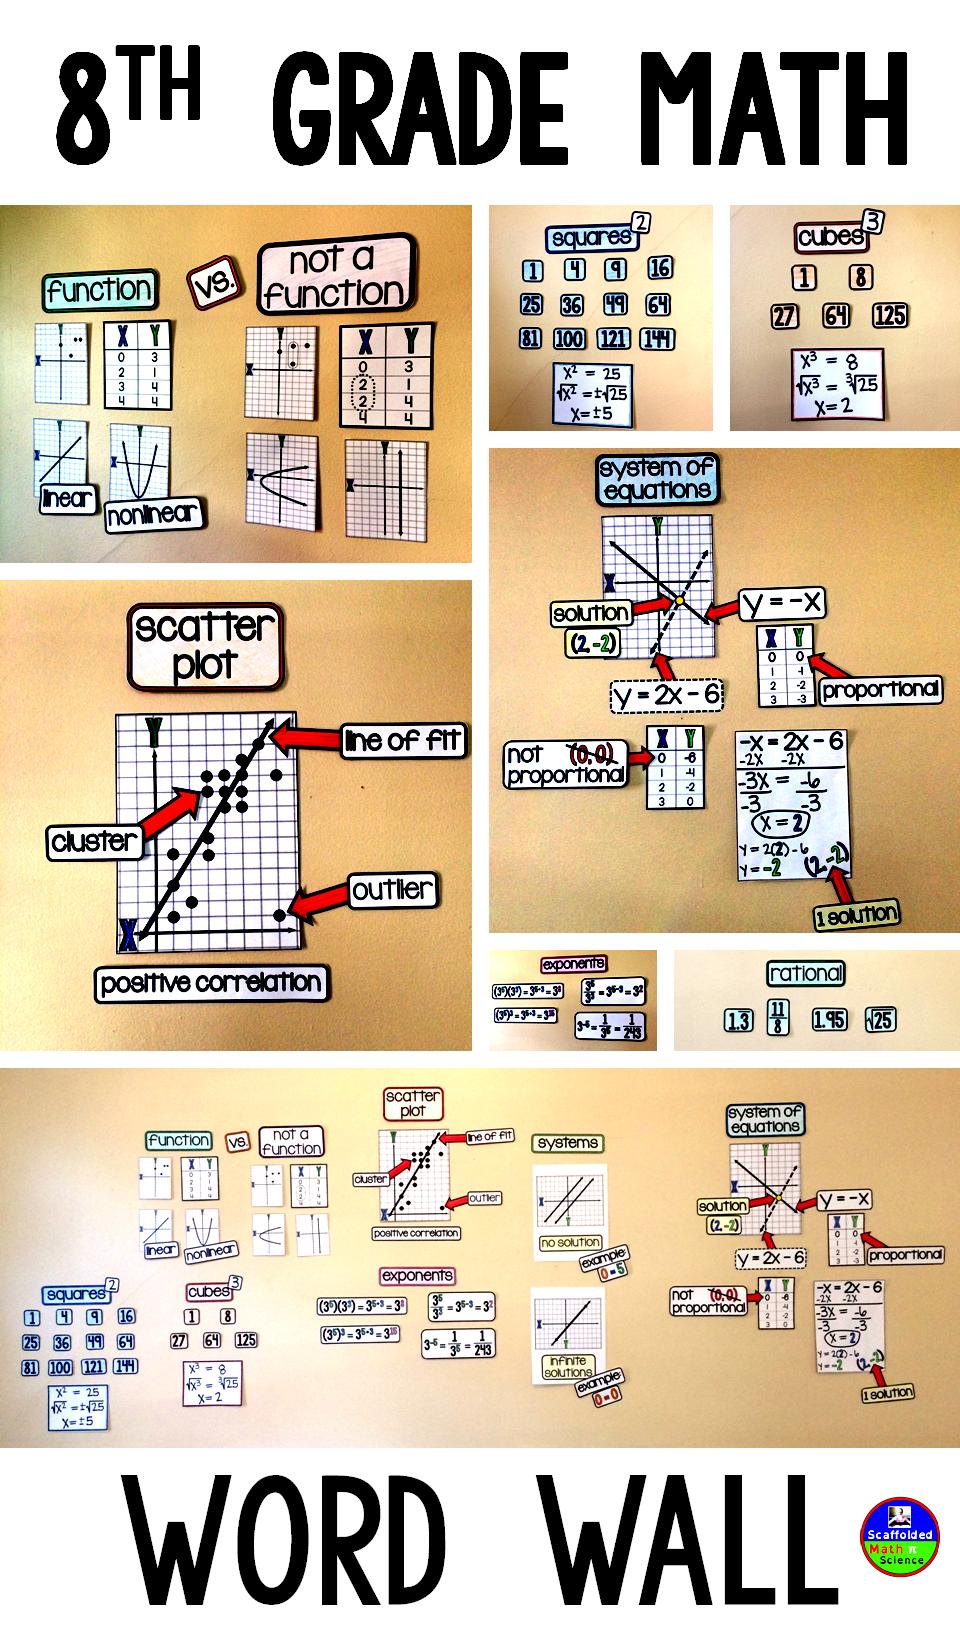 8th Grade Math Word Wall Print And Digital High School Math Word Wall Math Word Walls 8th Grade Math [ 1632 x 960 Pixel ]